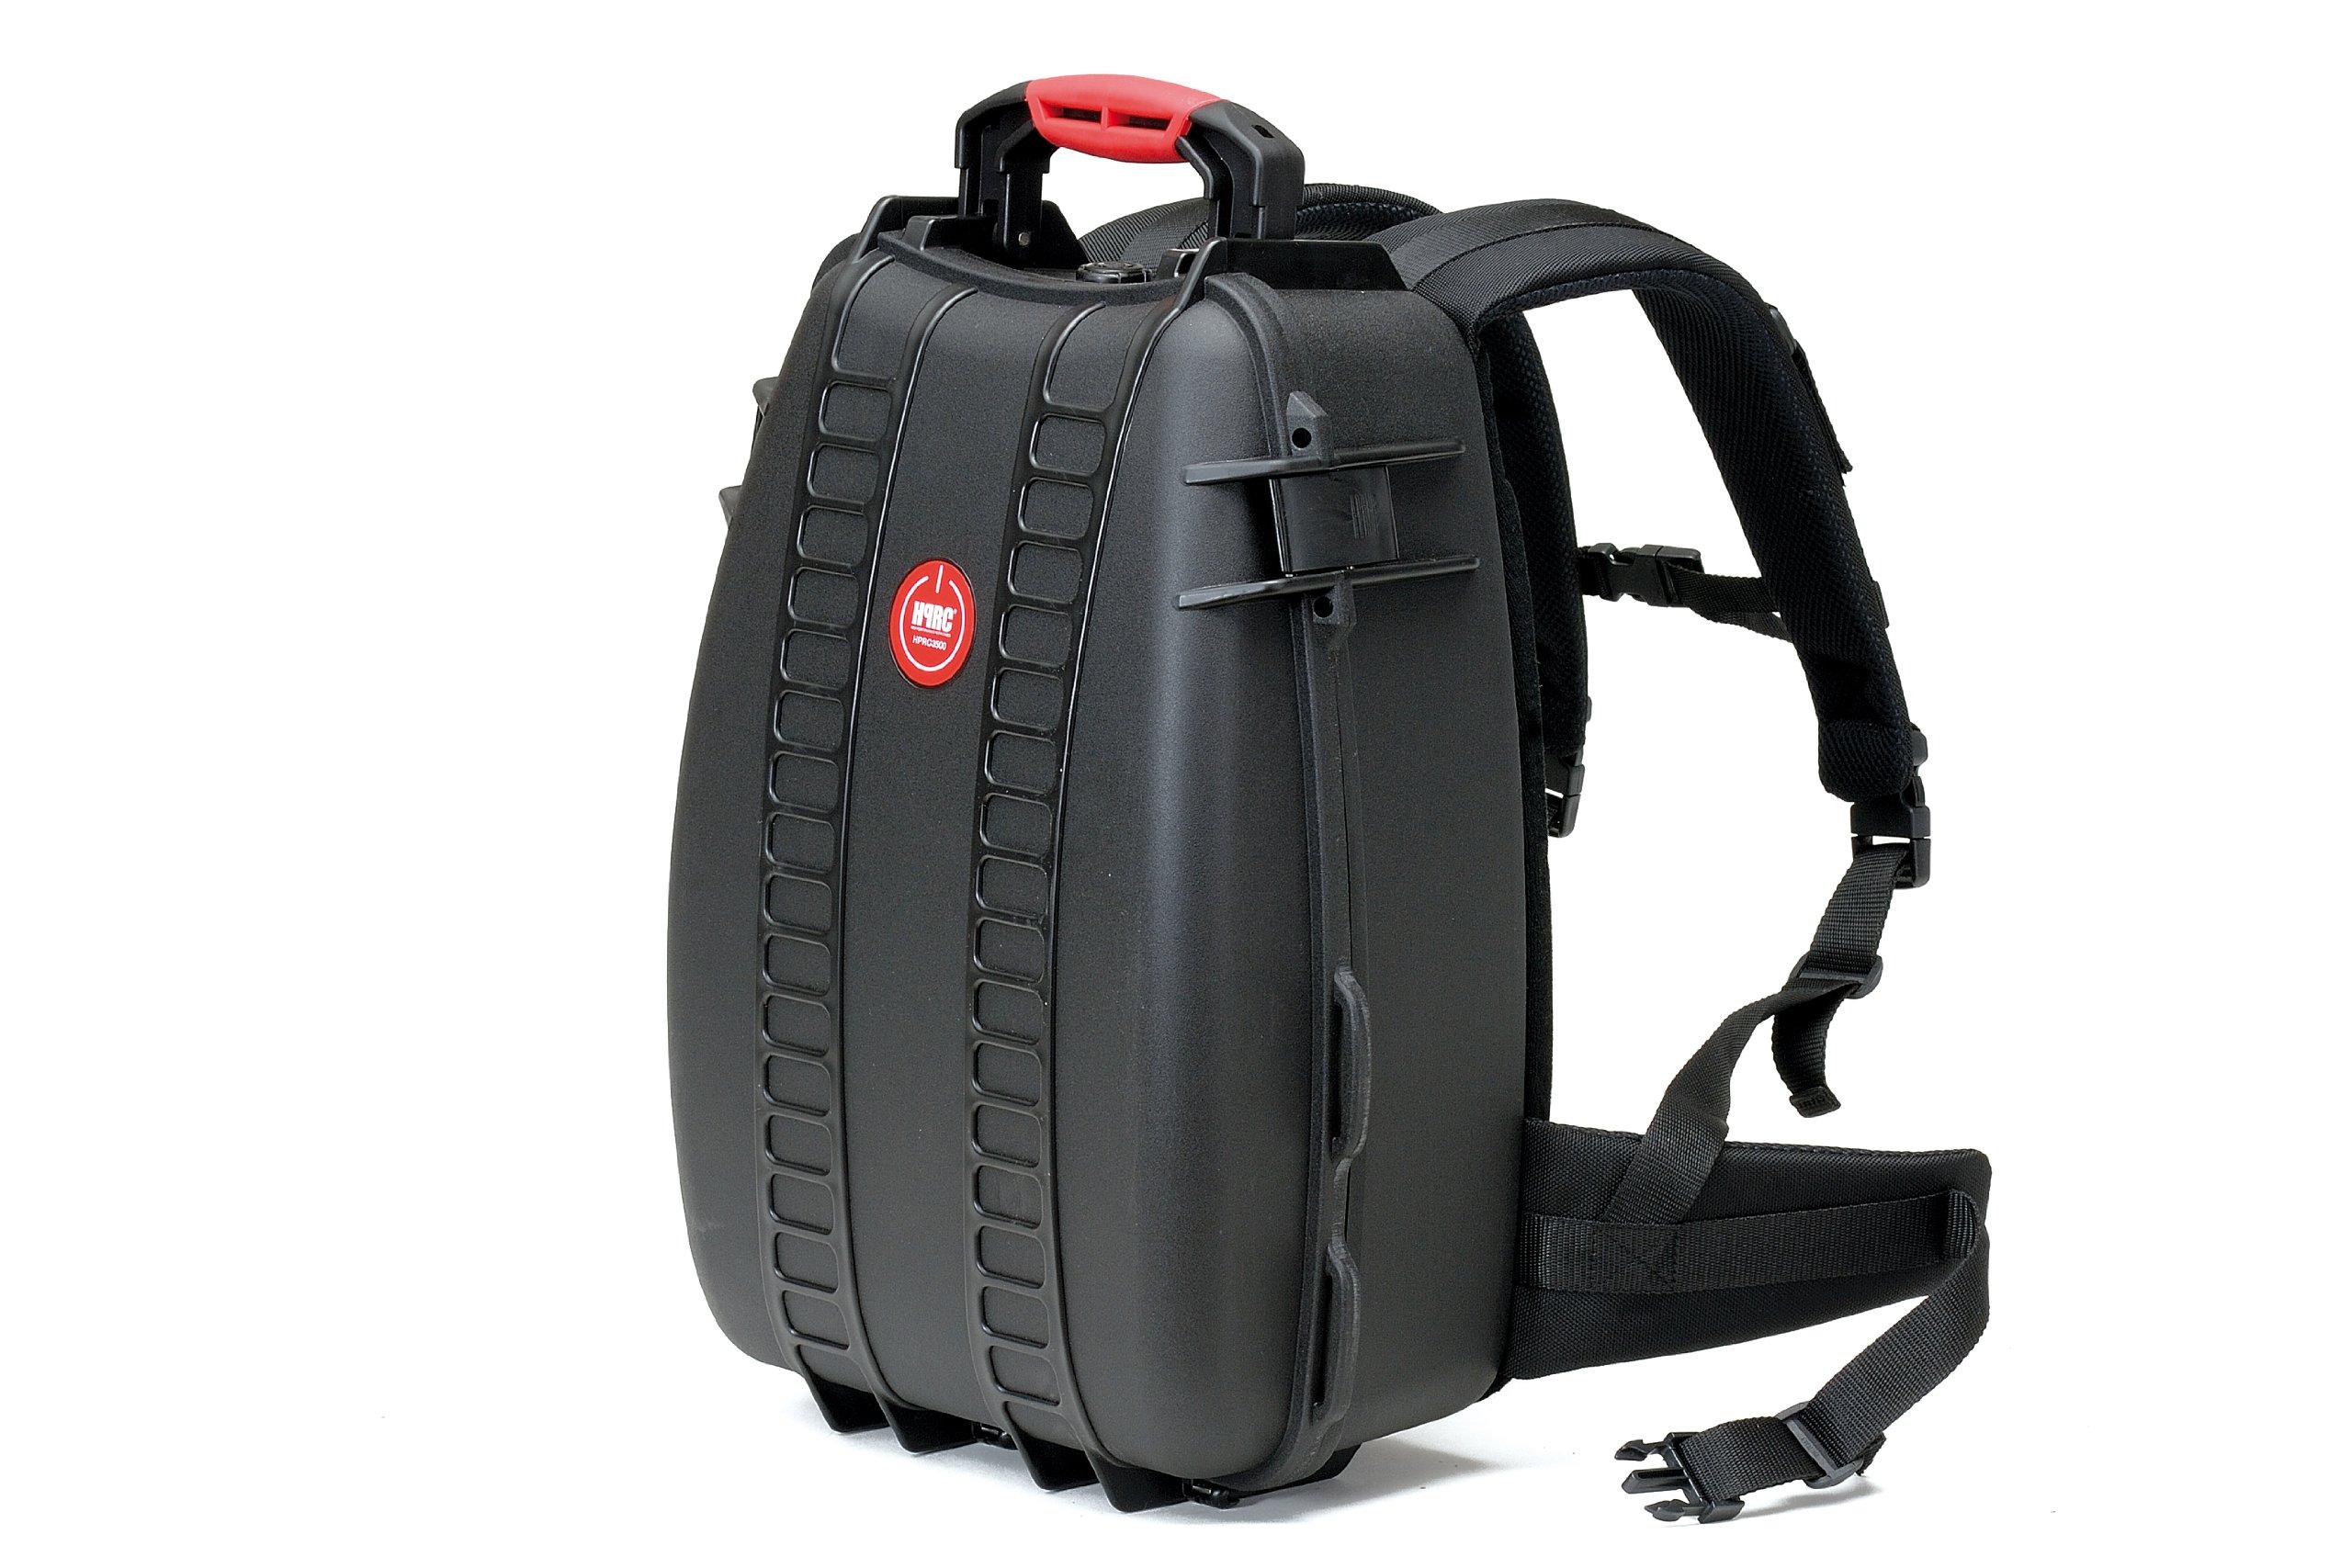 HPRC 3500DK Backpack Hard Case with Divider Kit (Black) by HPRC